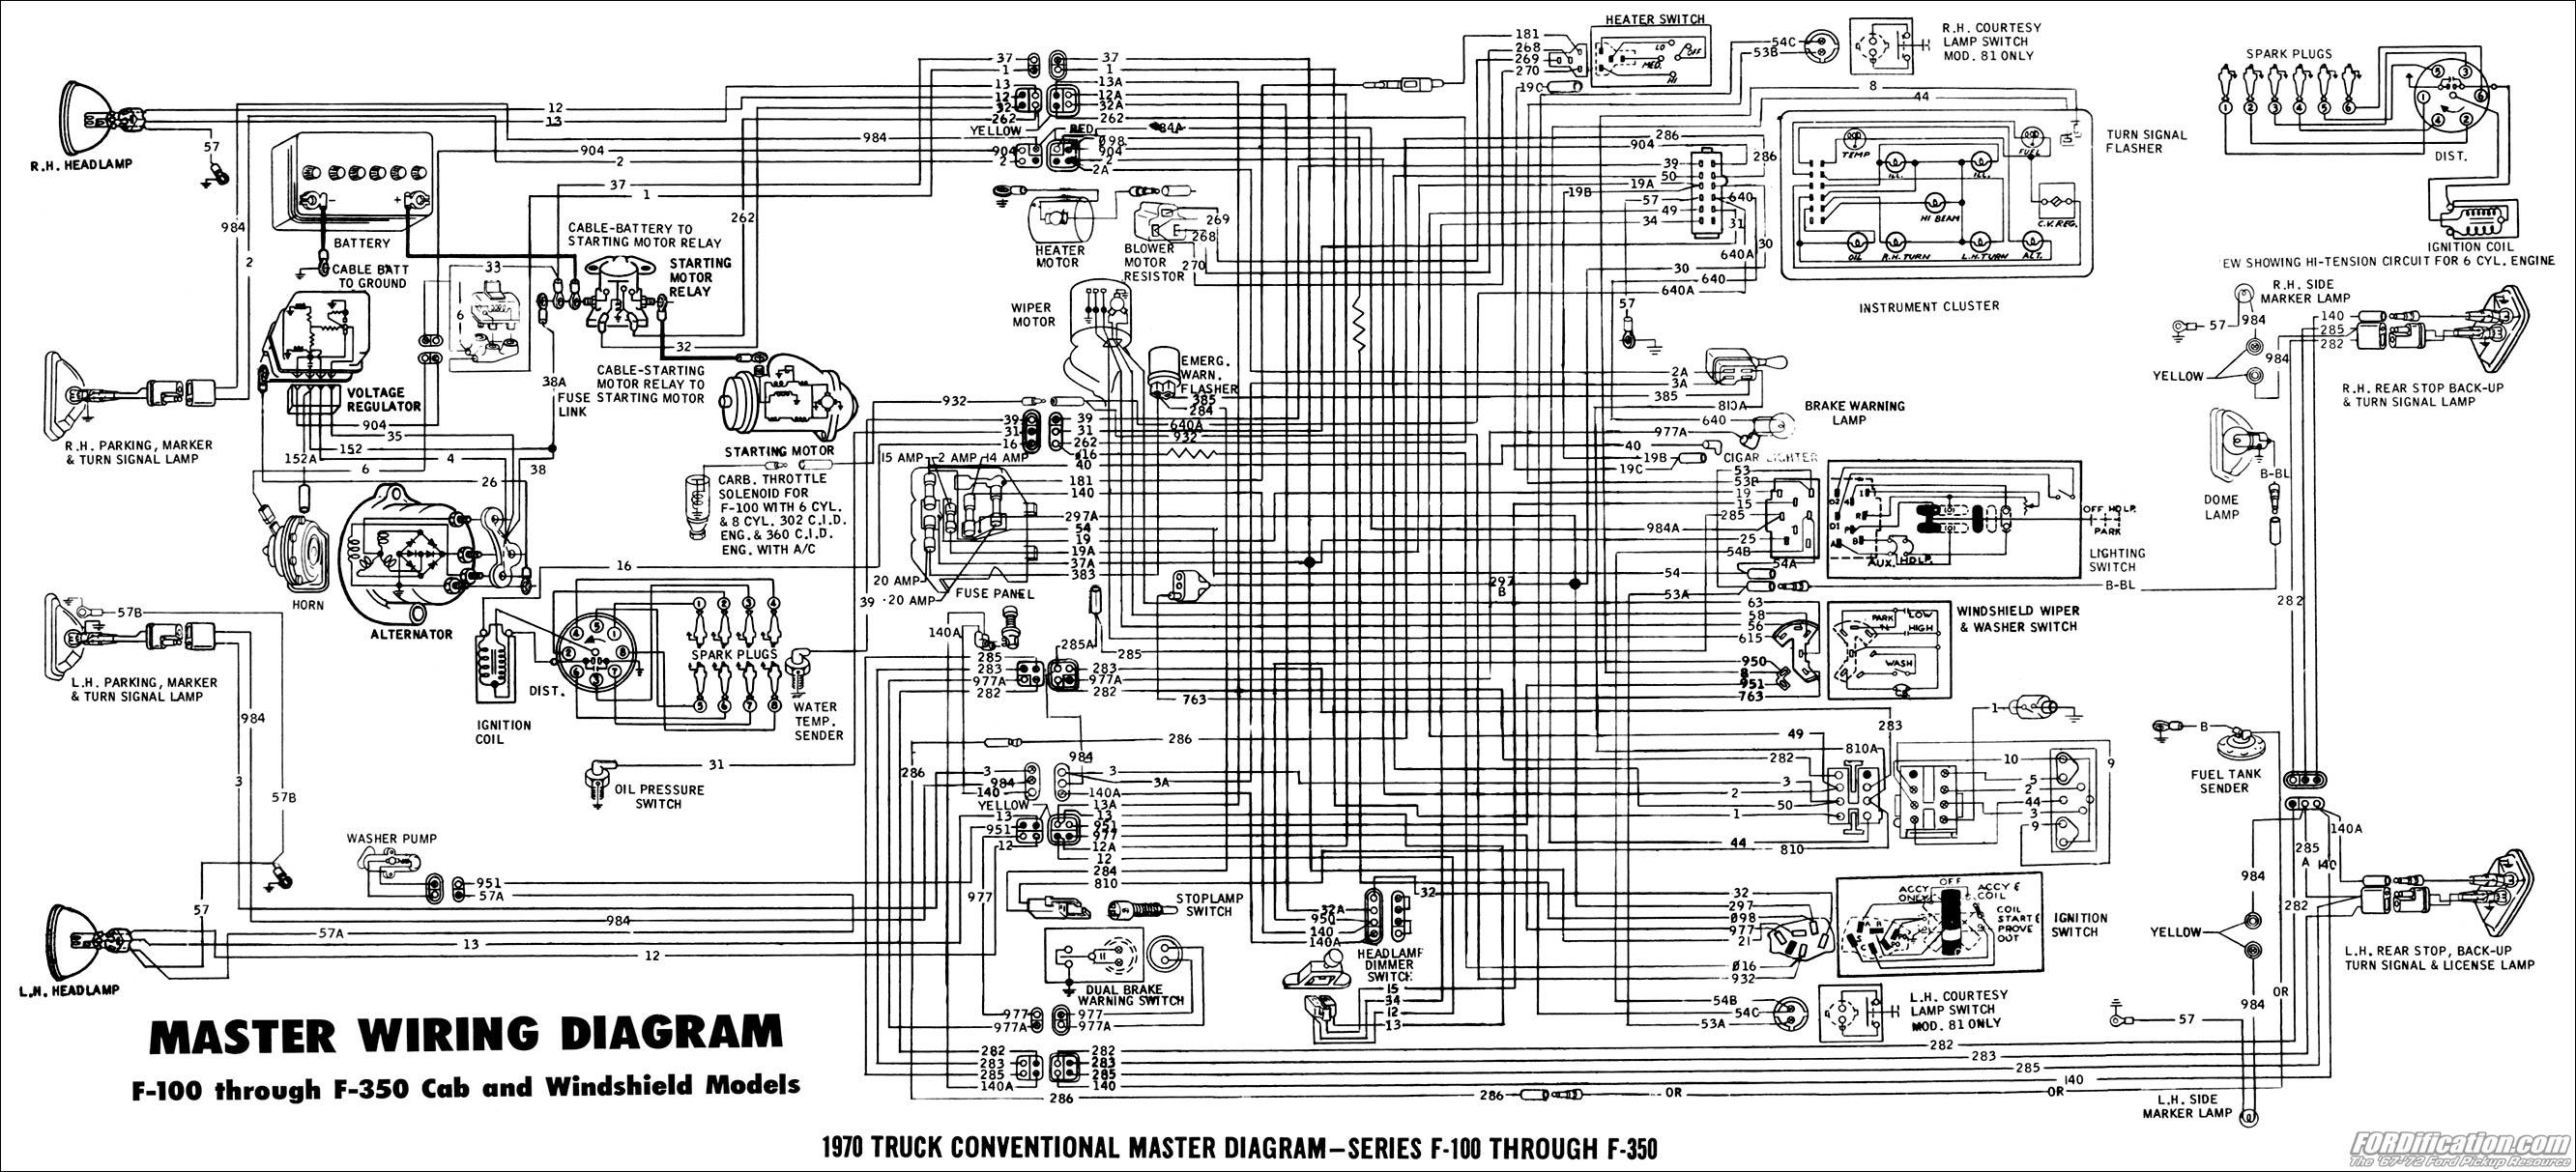 Valet Remote Start Wiring Diagram Schematic Diagrams Avital 4x03